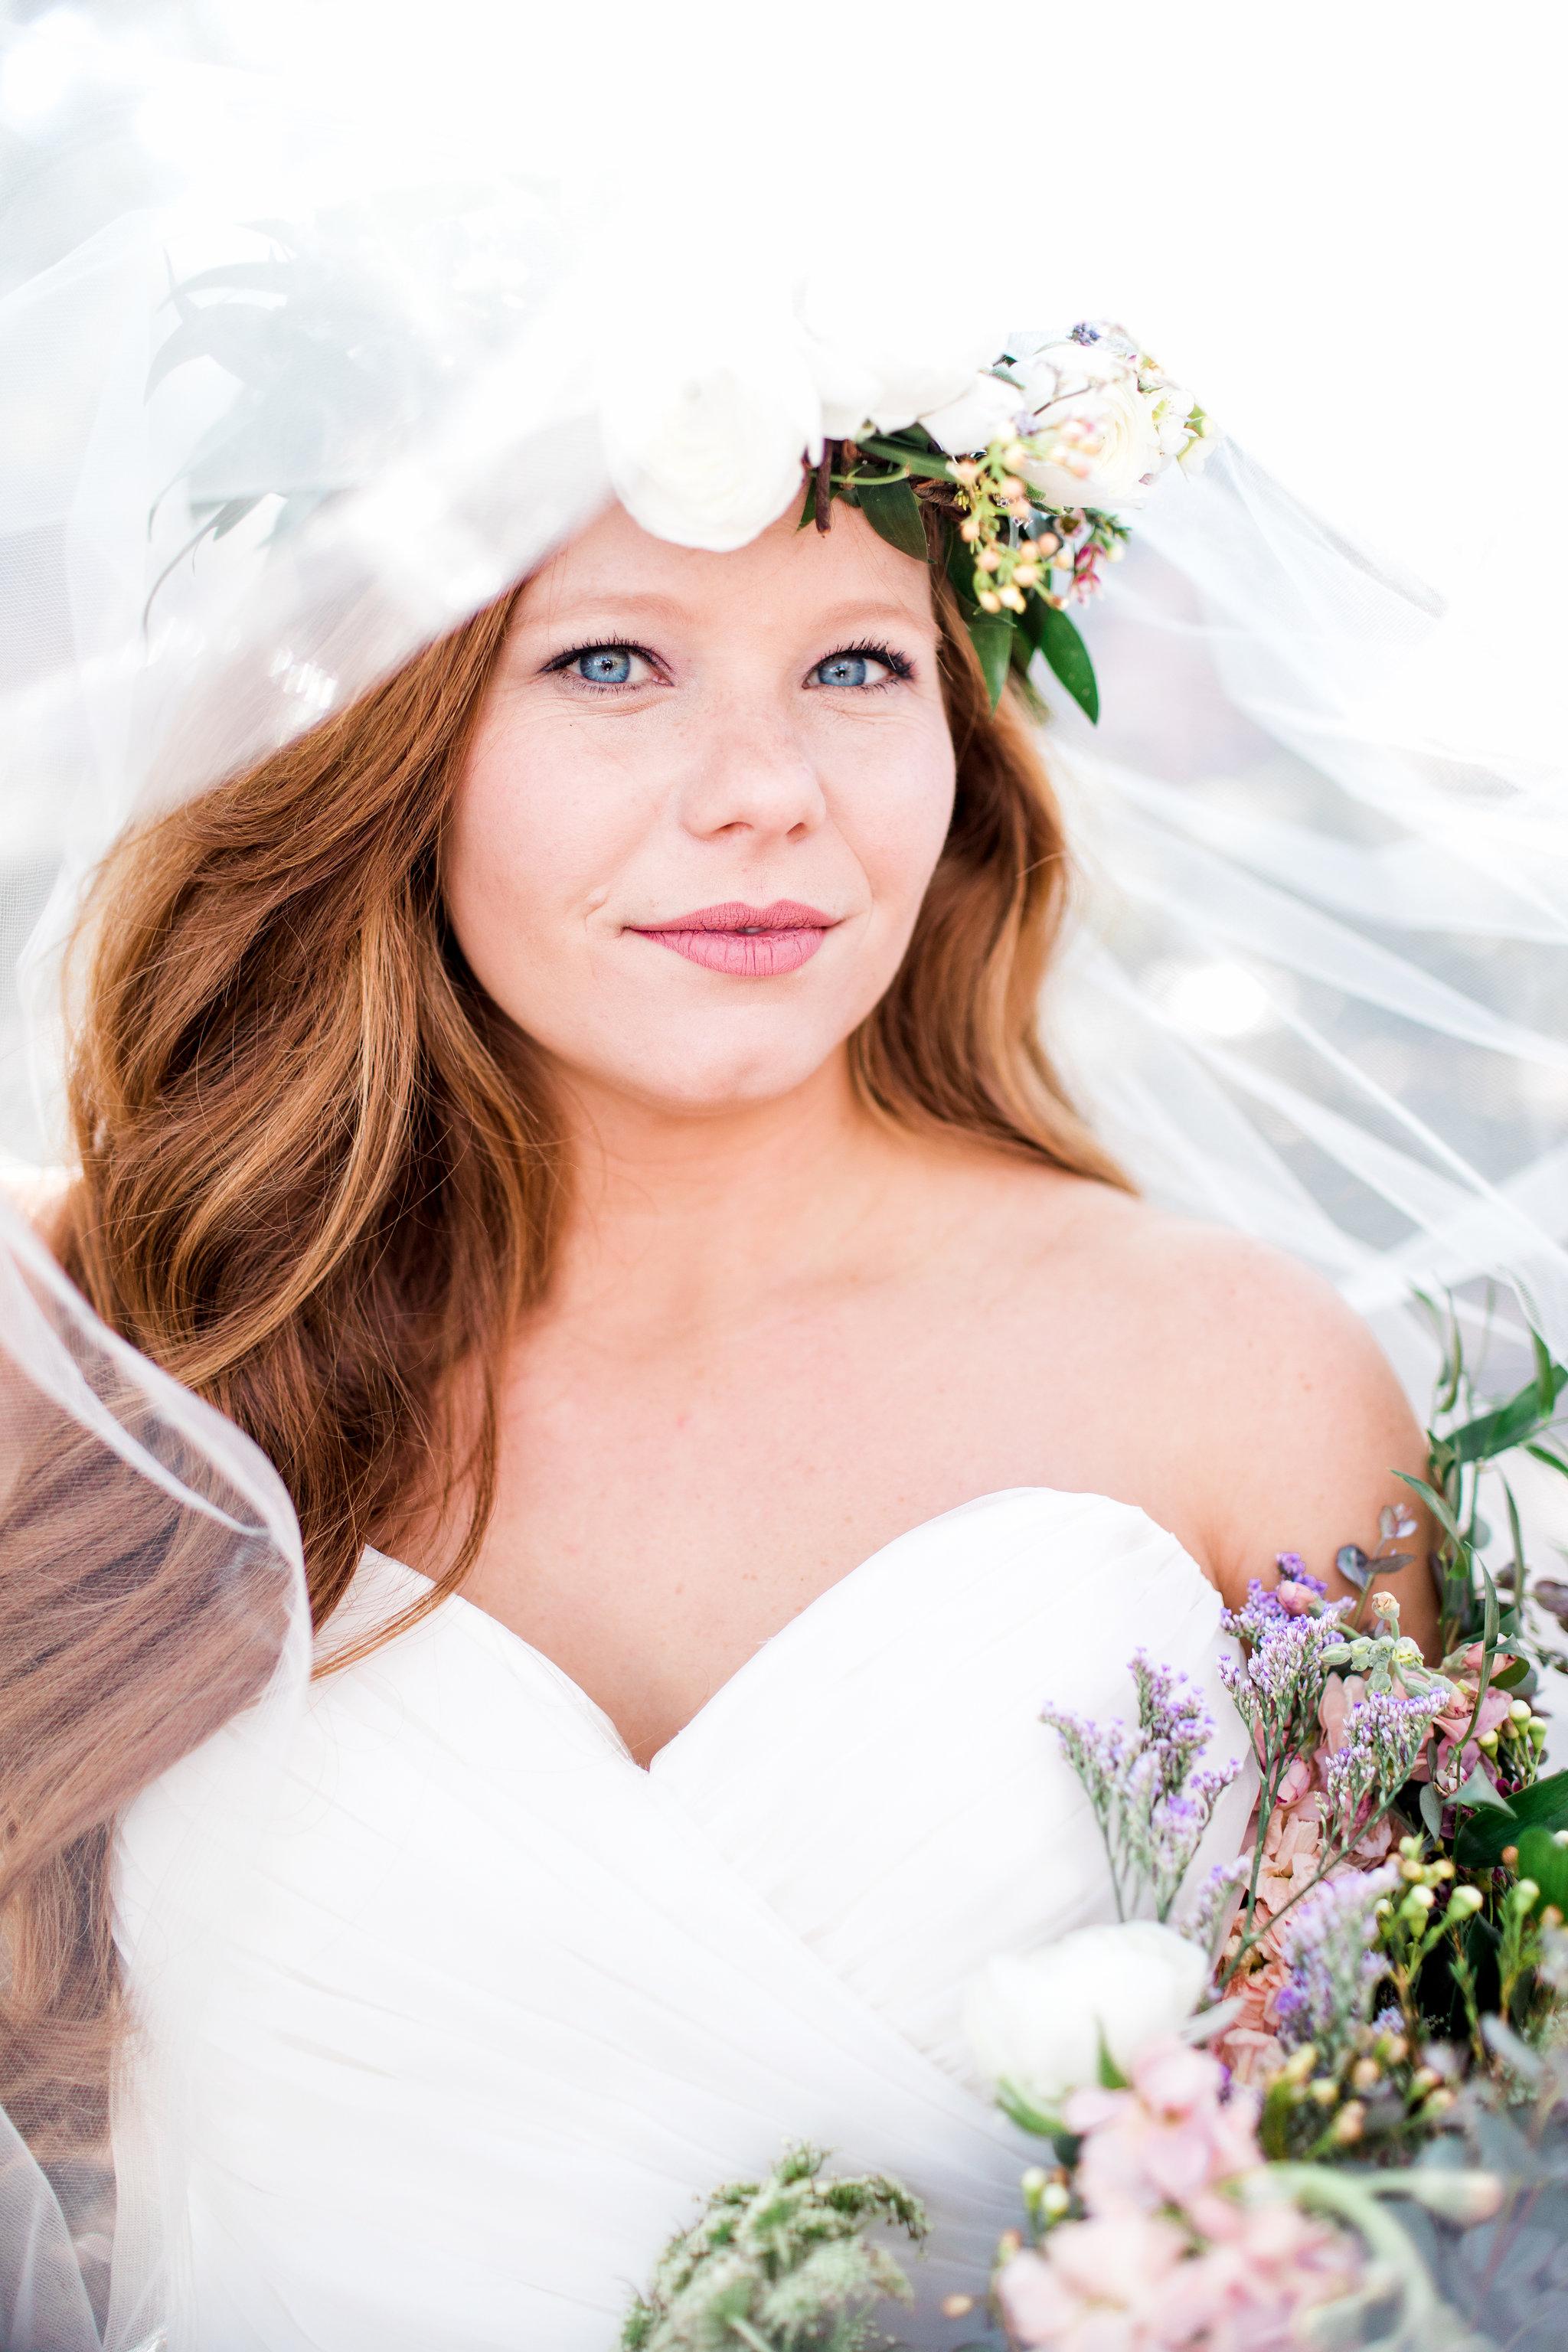 apt-b-photography-mary-elizabeths-bridal-boutique-adele-amelia-accessories-morilee-5504-savannah-bridal-boutique-savannah-weddings-savannah-wedding-photographer-savannah-bridal-gowns-savannah-wedding-dresses-historic-savannah-wedding-12.jpg